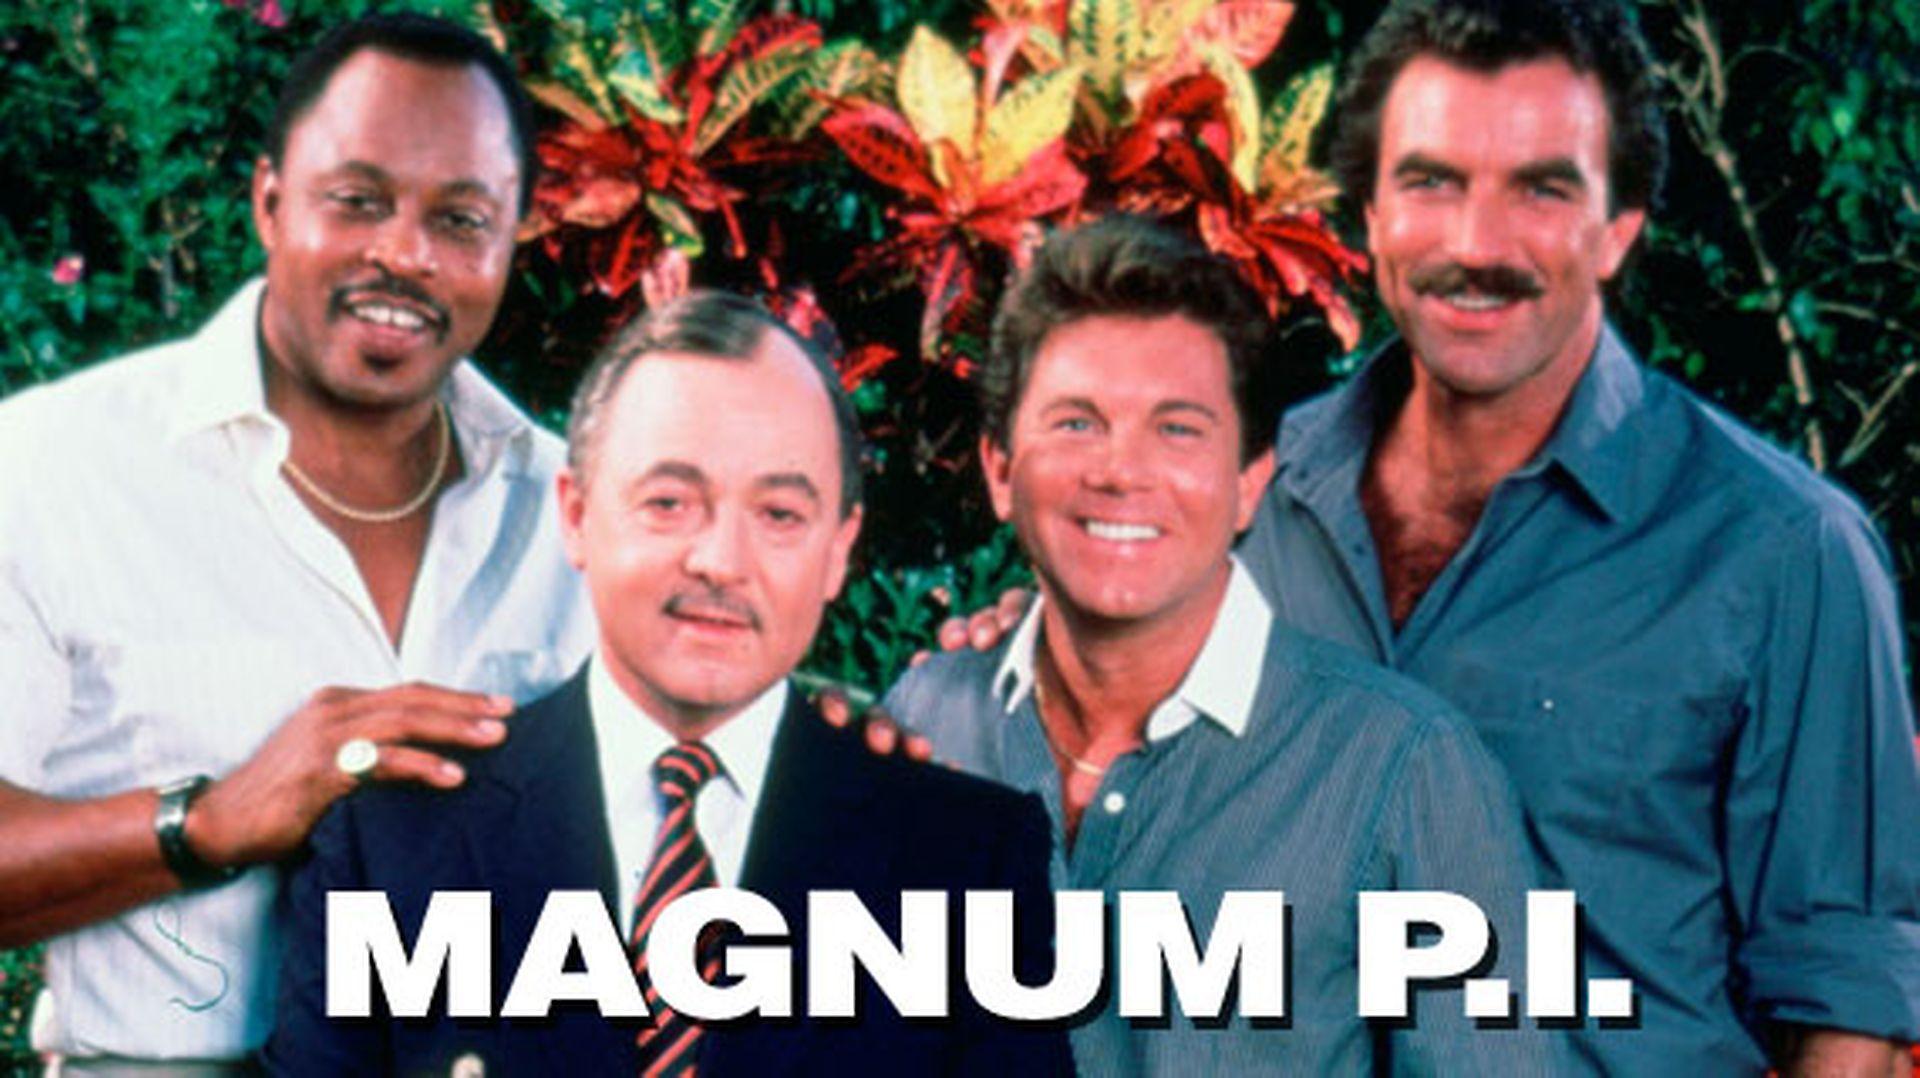 Magnum p i 1980 1988 grade b voice of cinema - Tom selleck shows ...